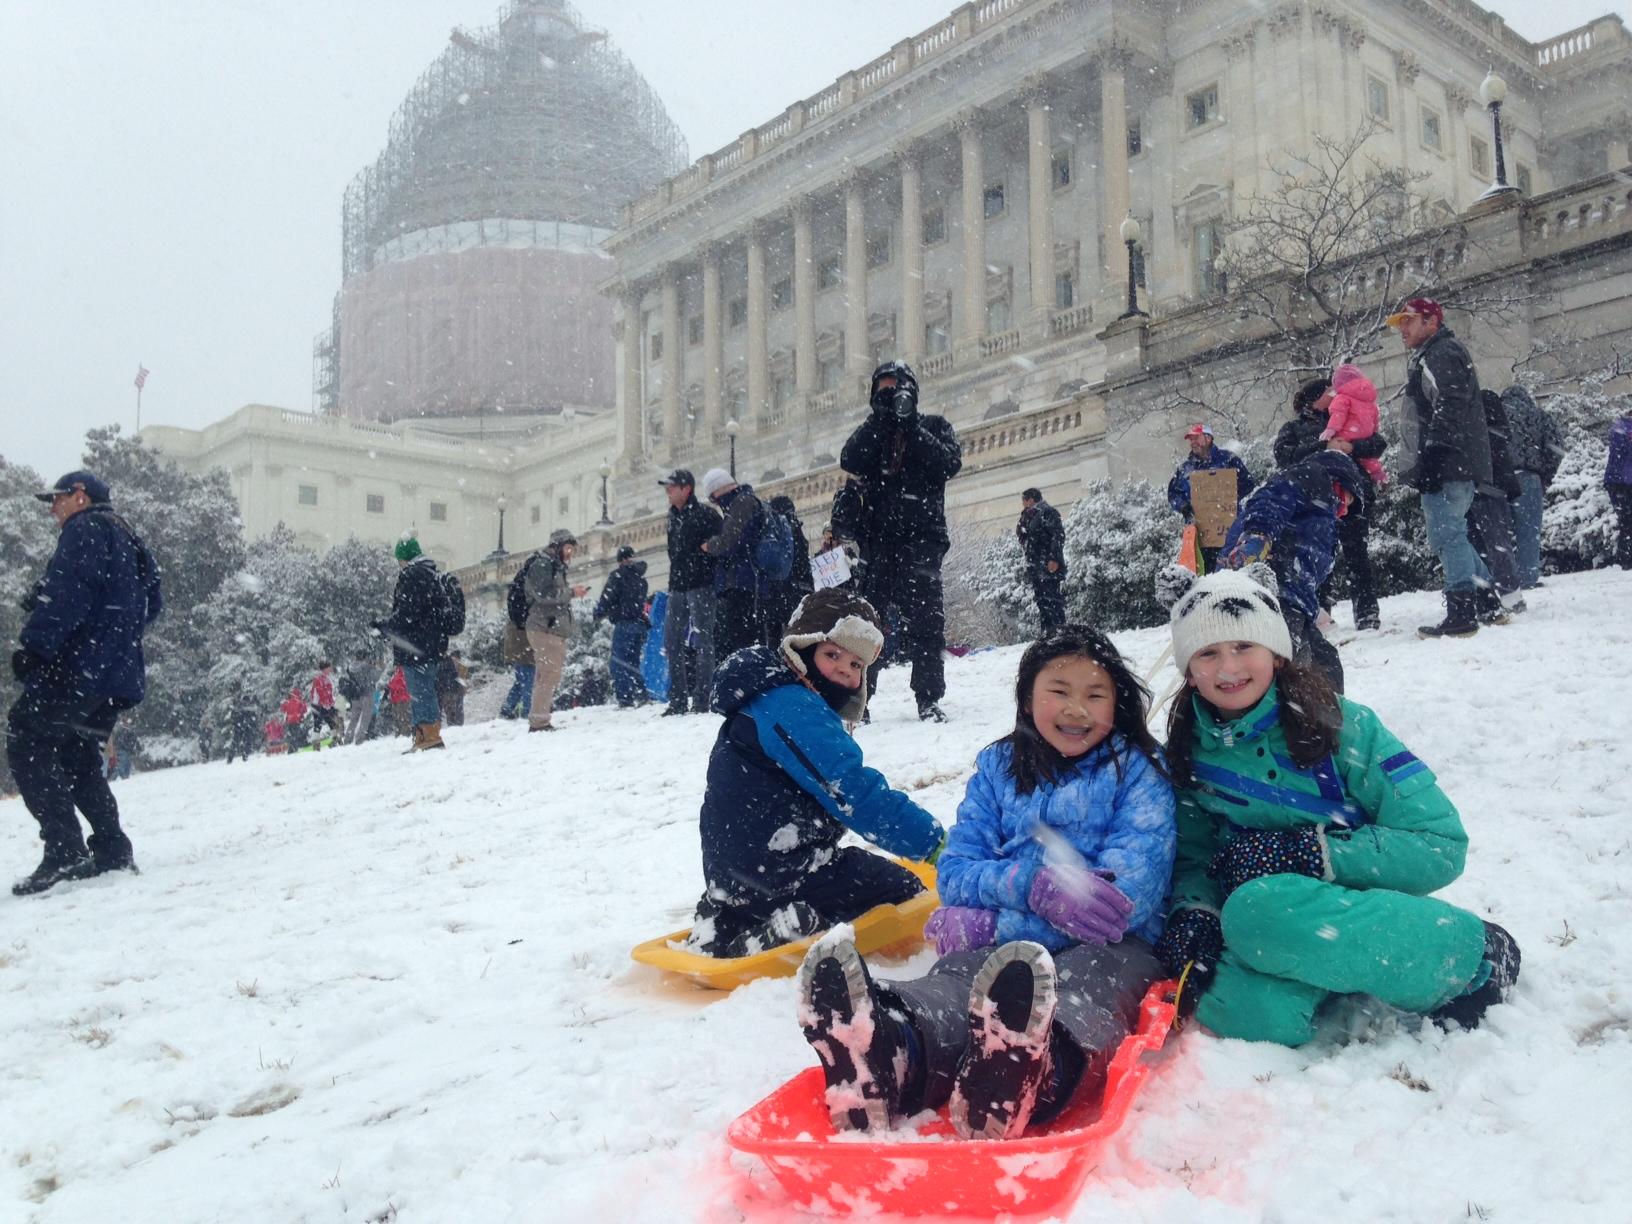 Winter win: Congress lifts Capitol Hill sledding ban